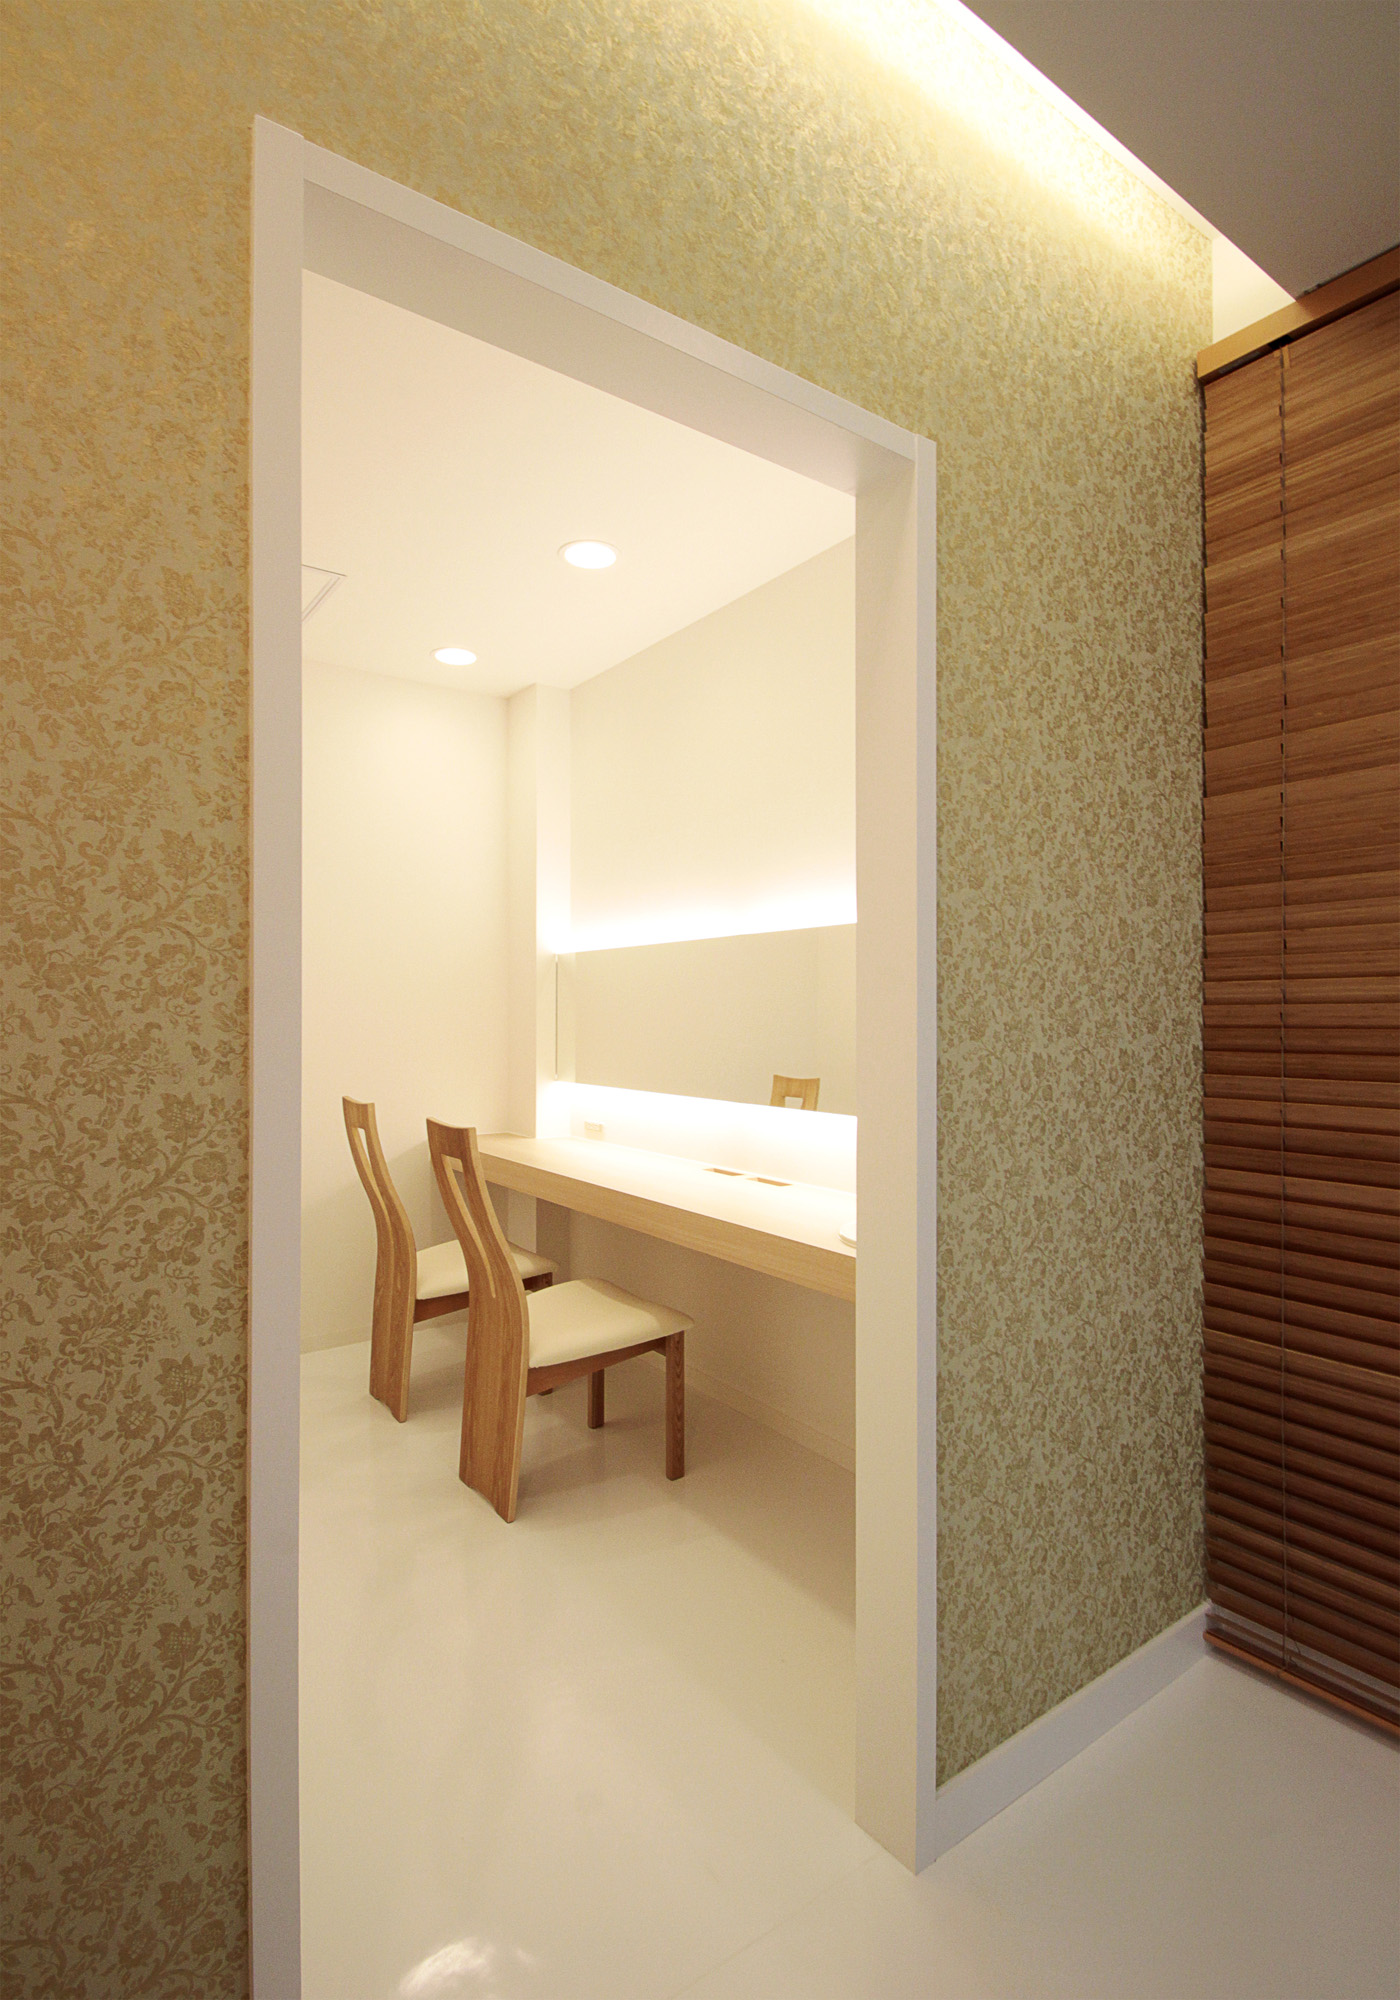 09 - t-d-clinic-t-lex-brain-design-office_mooponto